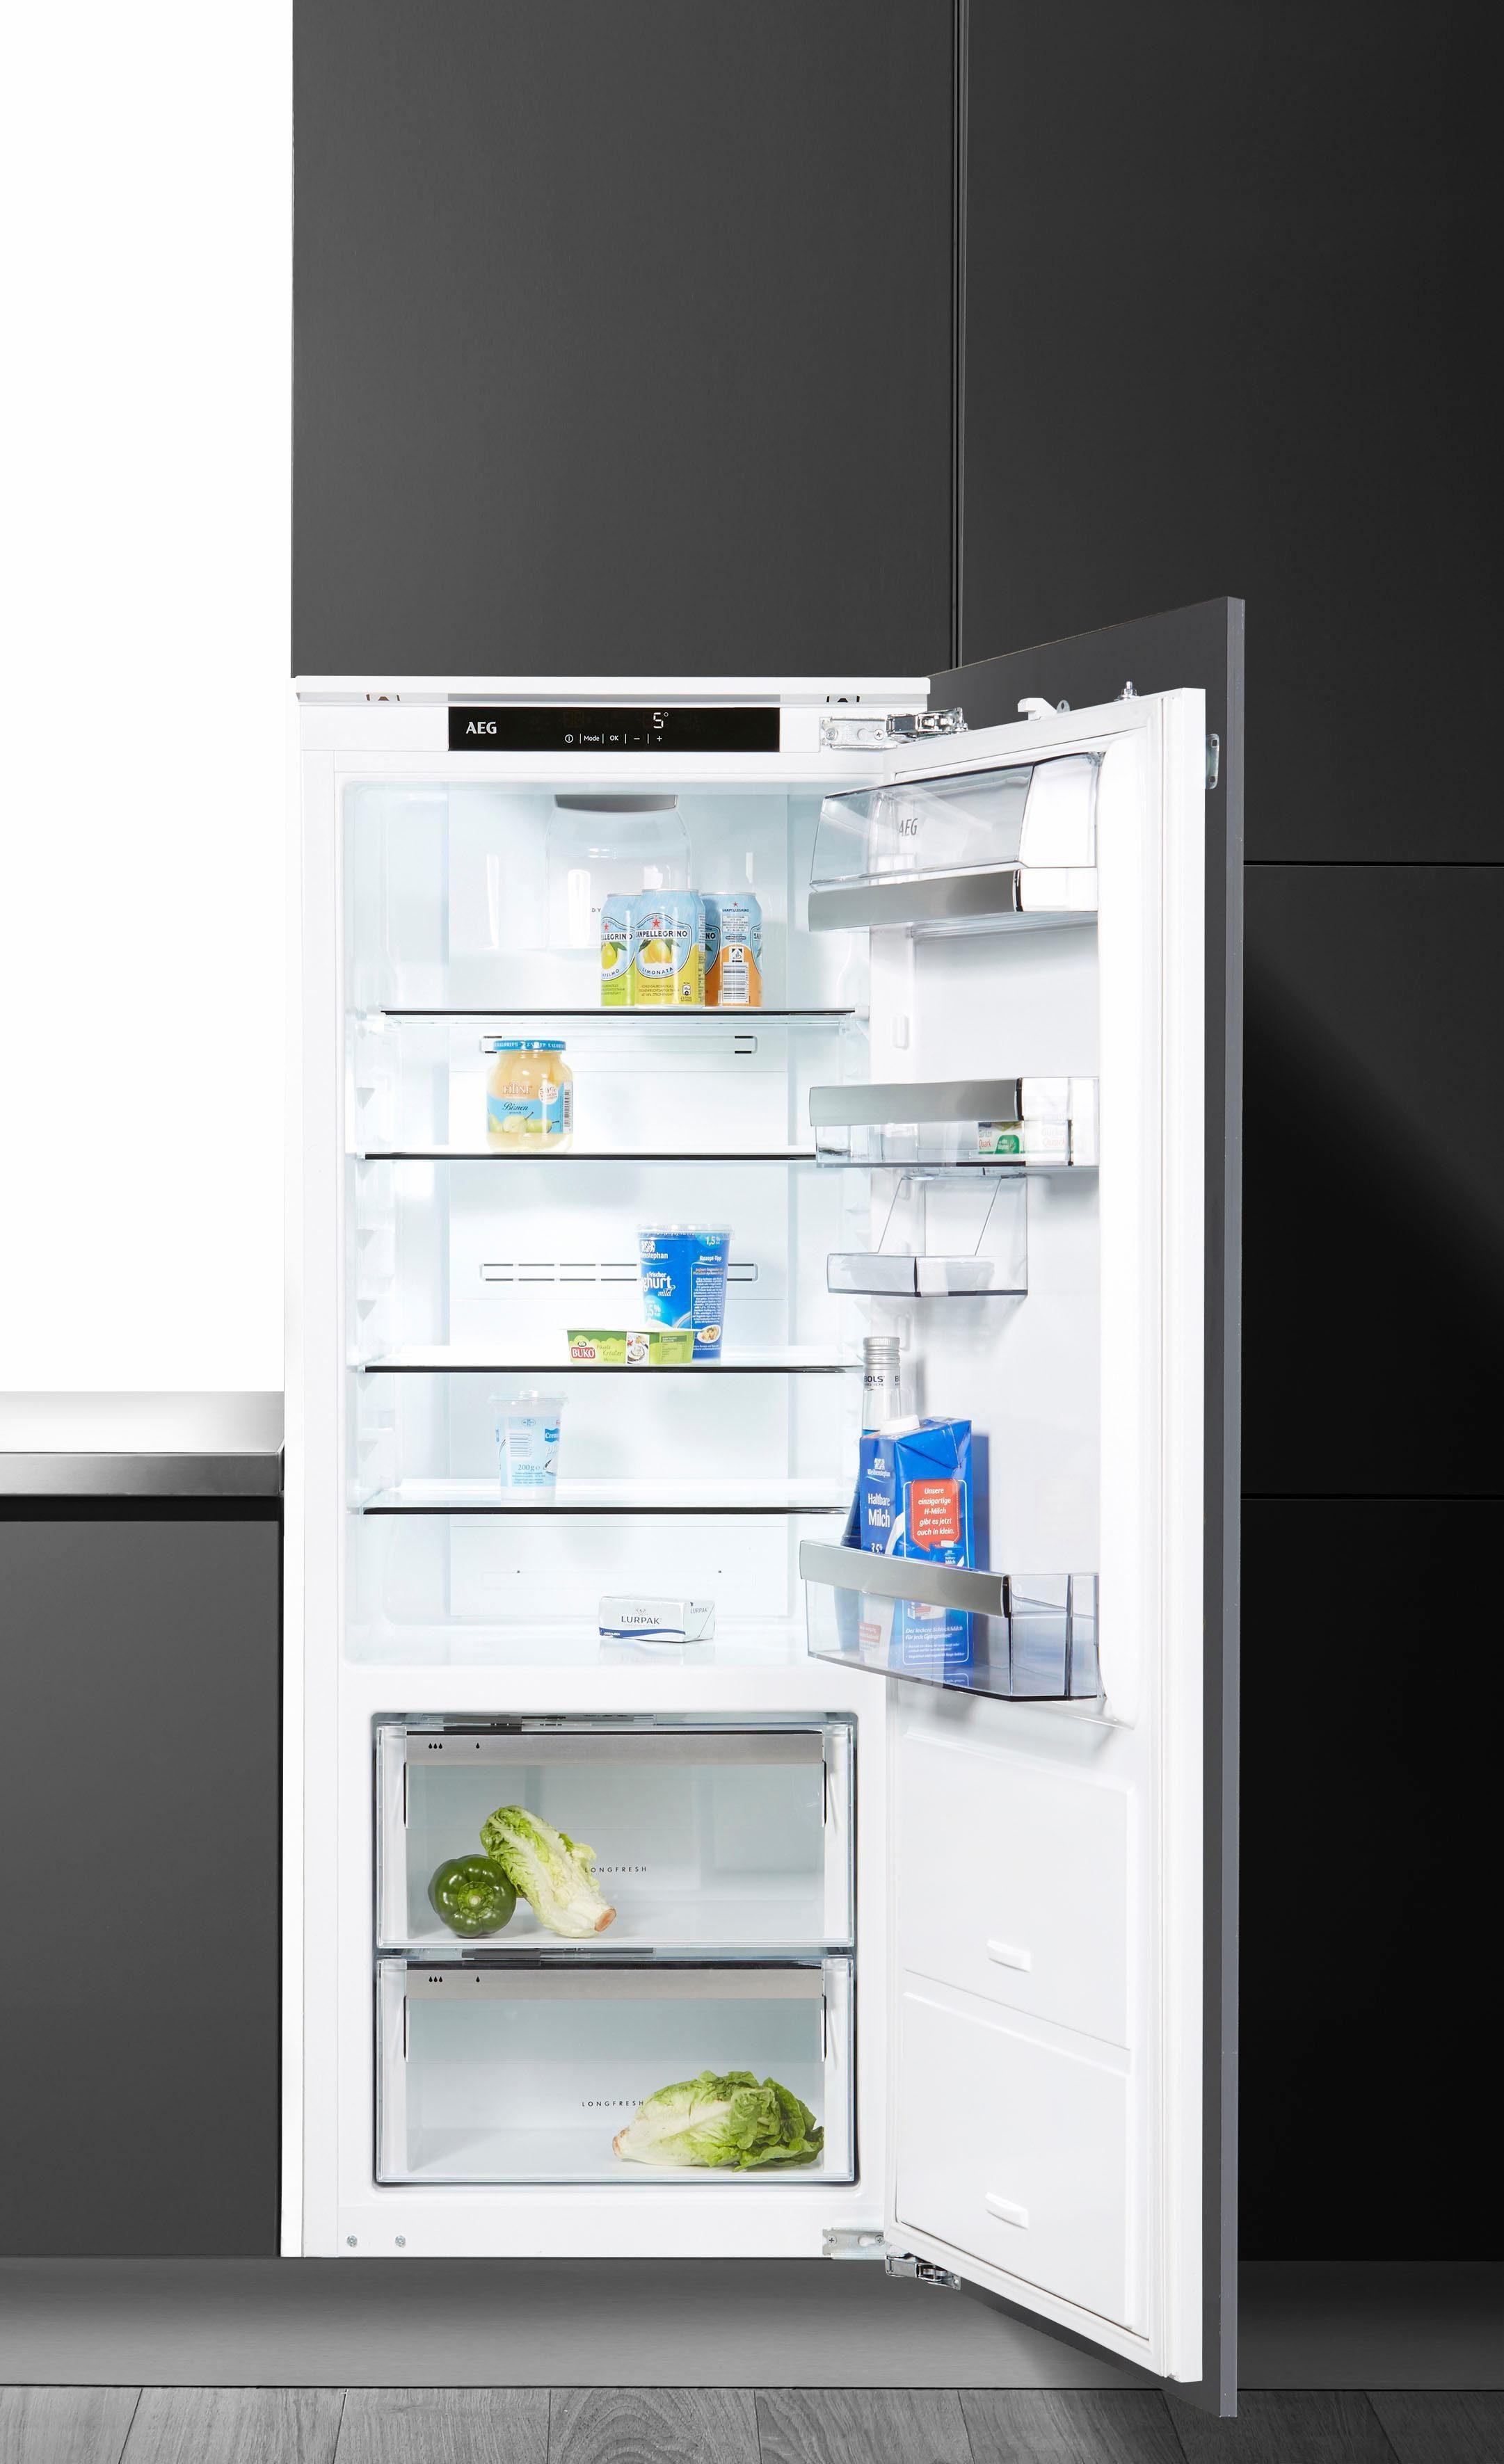 AEG integrierbarer Einbau-Kühlschrank SANTO SKE81426ZC, A++, 140 cm hoch